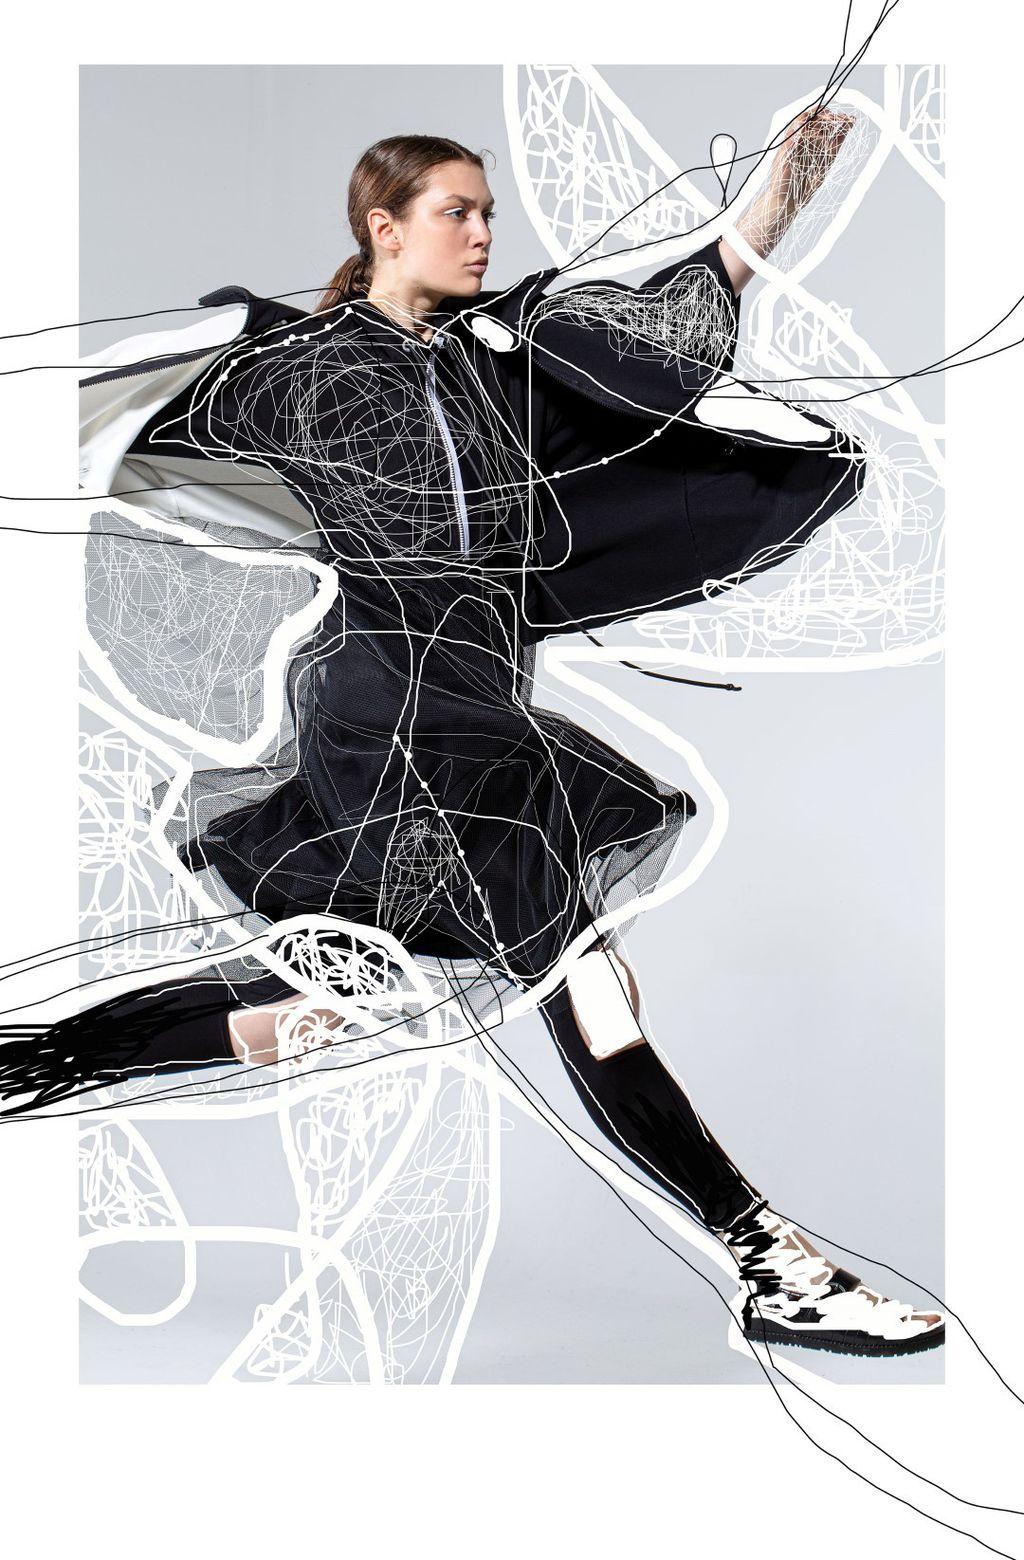 LINK by Ogi Antunac - 10